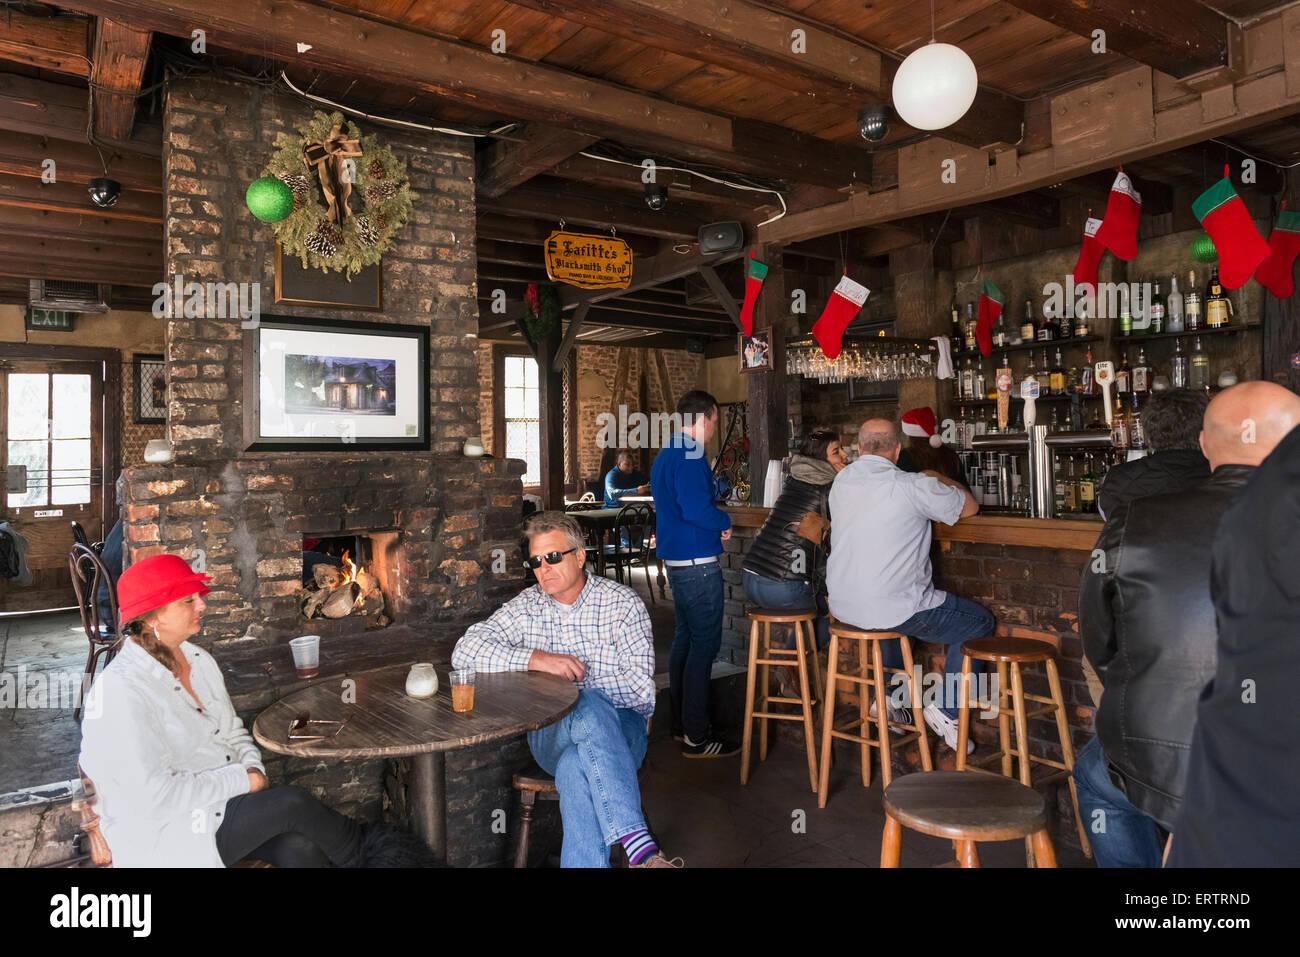 inside lafitte 39 s blacksmith shop bar on bourbon street french stock photo 83524041 alamy. Black Bedroom Furniture Sets. Home Design Ideas